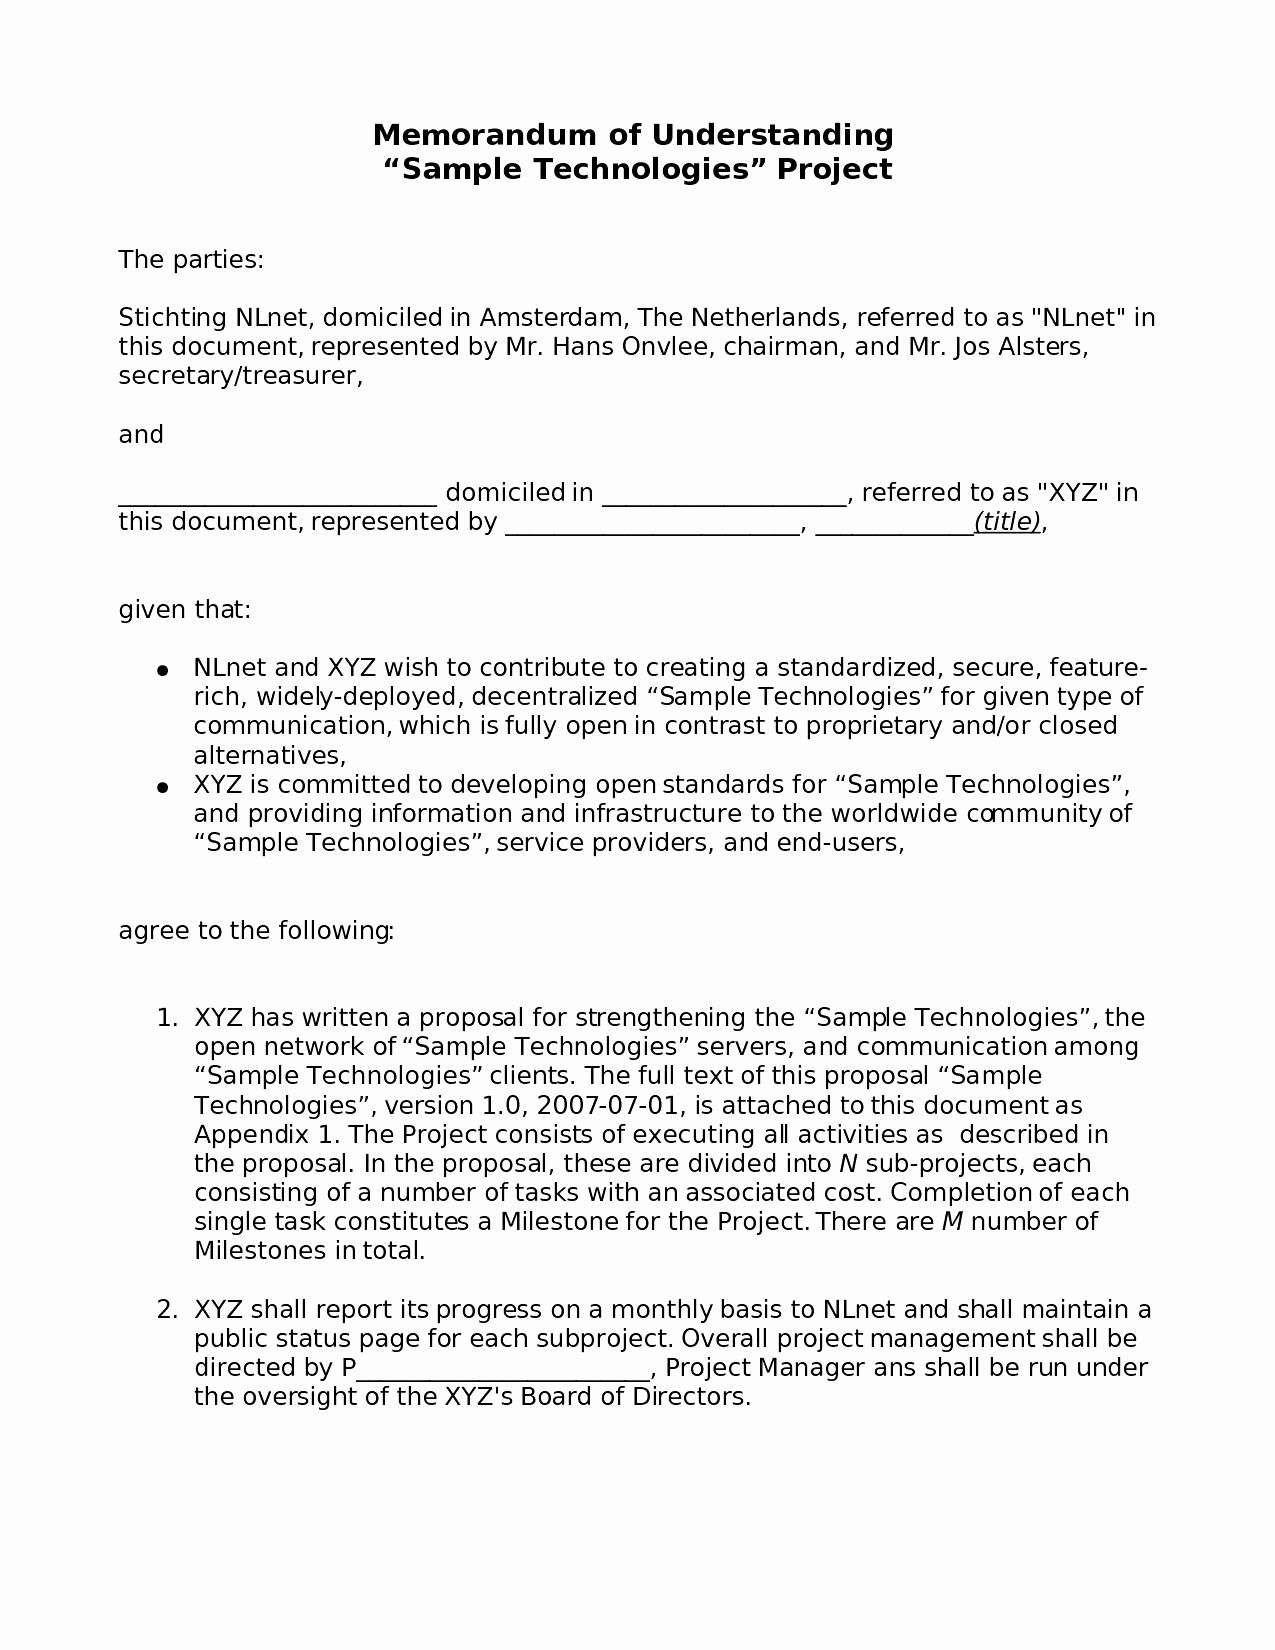 20 Memorandum Of Understanding Business Partnership Template